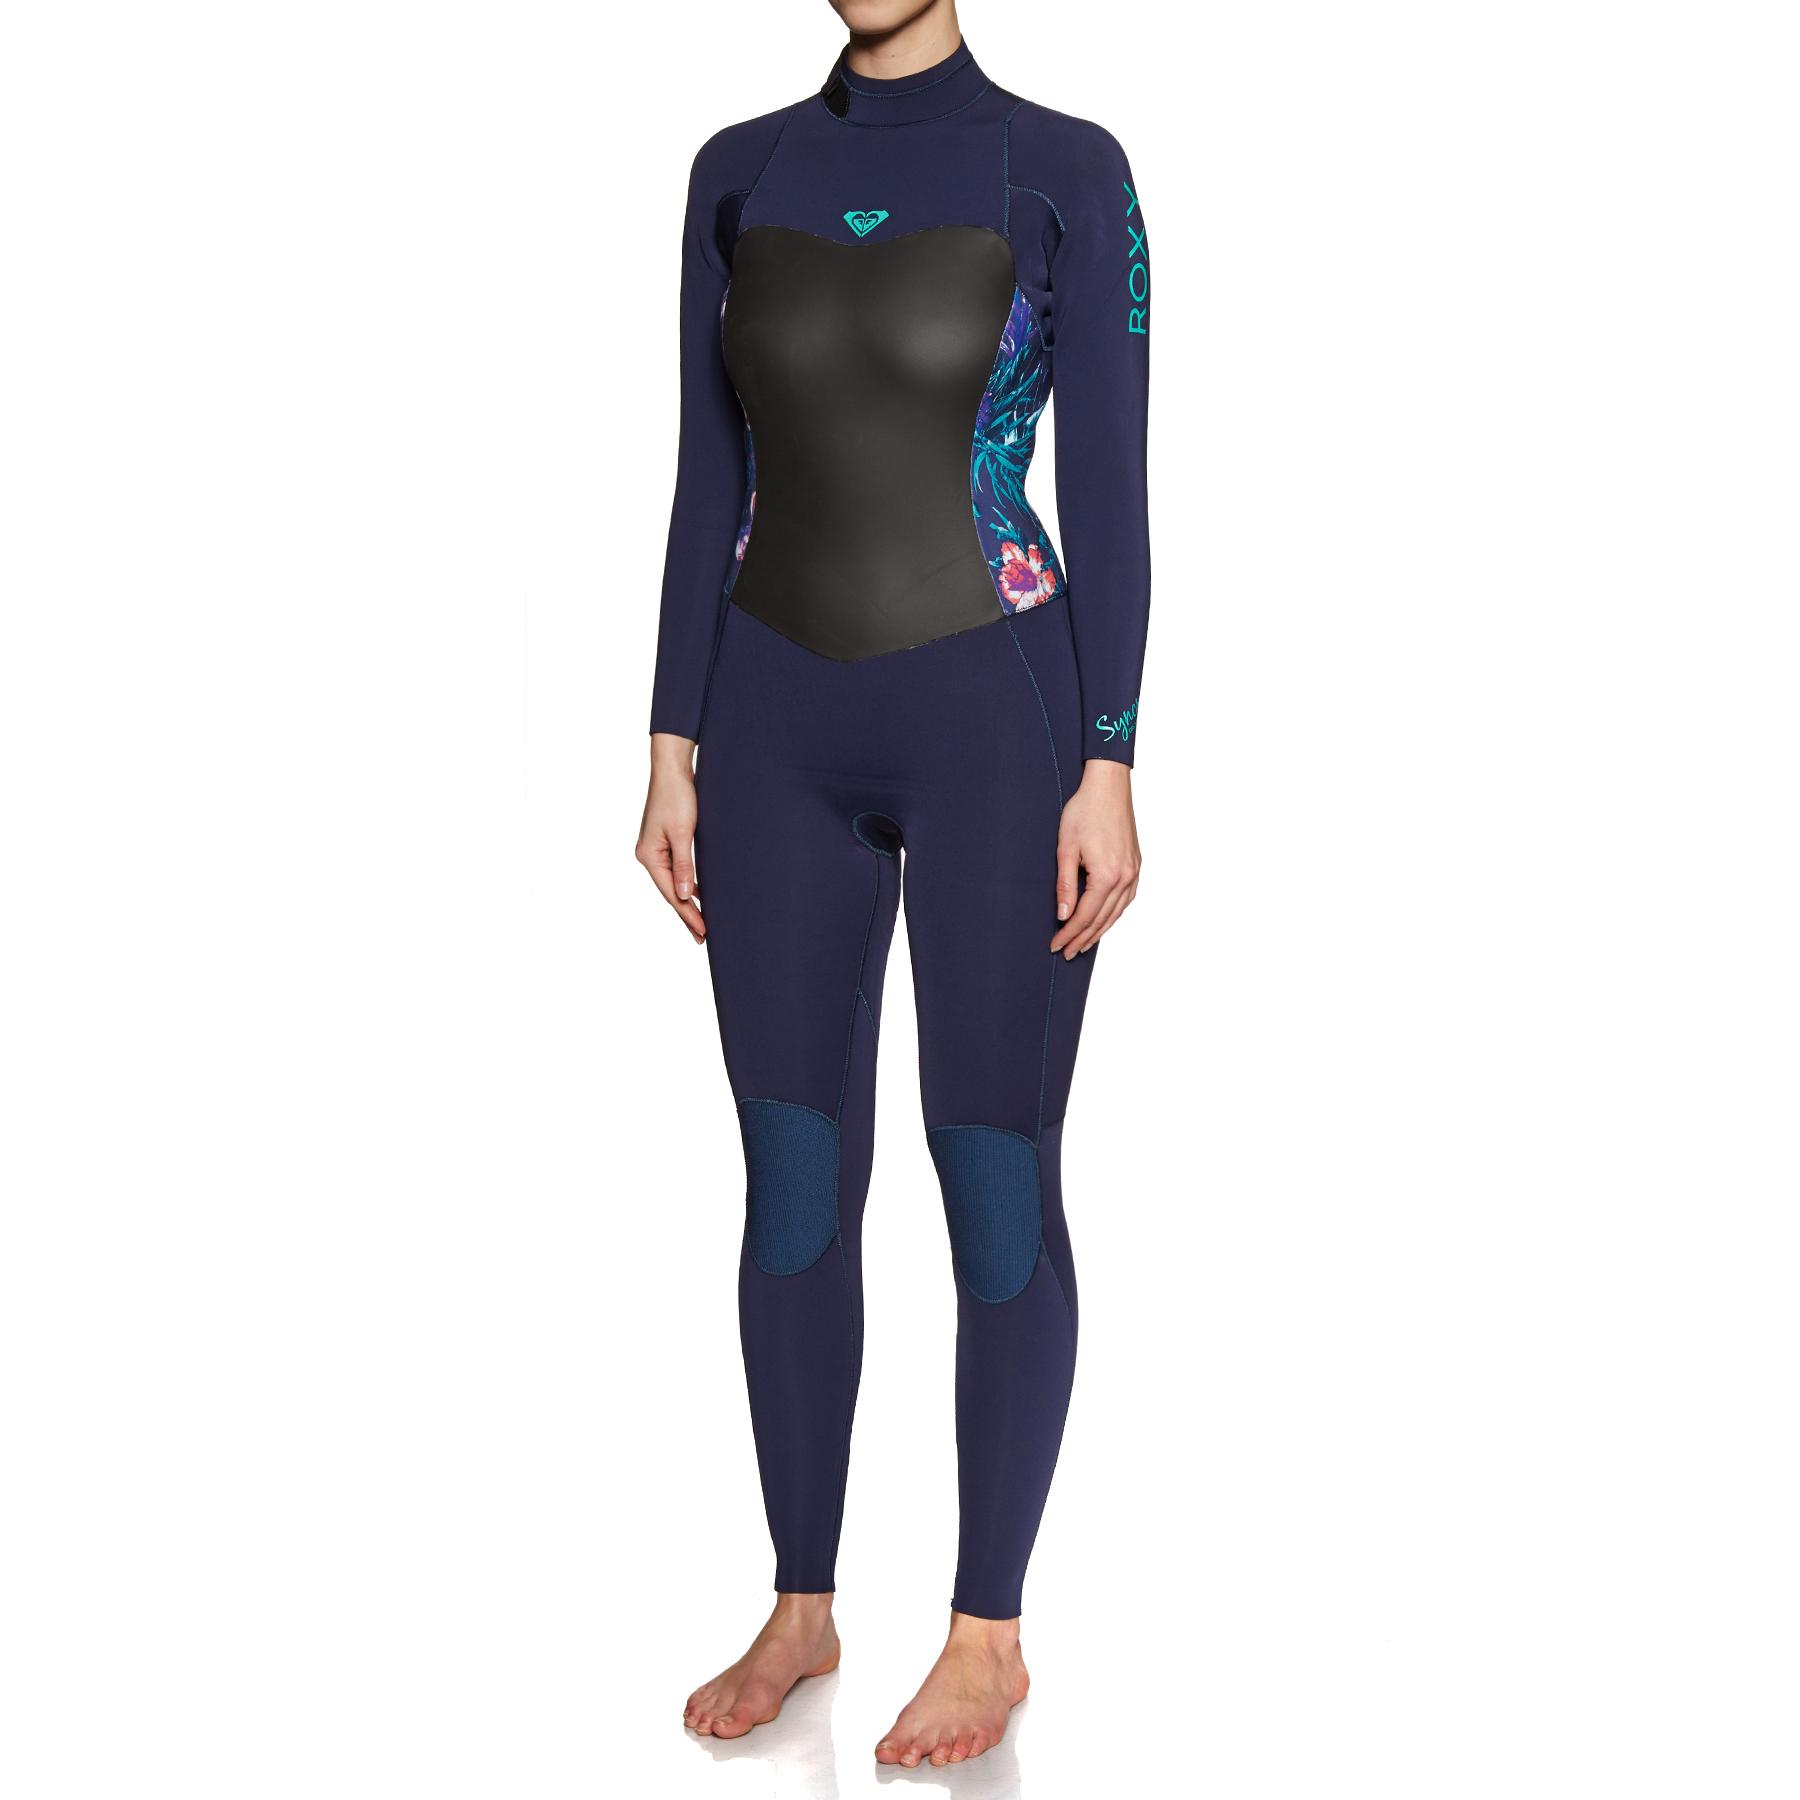 Roxy Syncro 3//2 Back Zip Fullsuit womens size 14 wetsuit new NWT